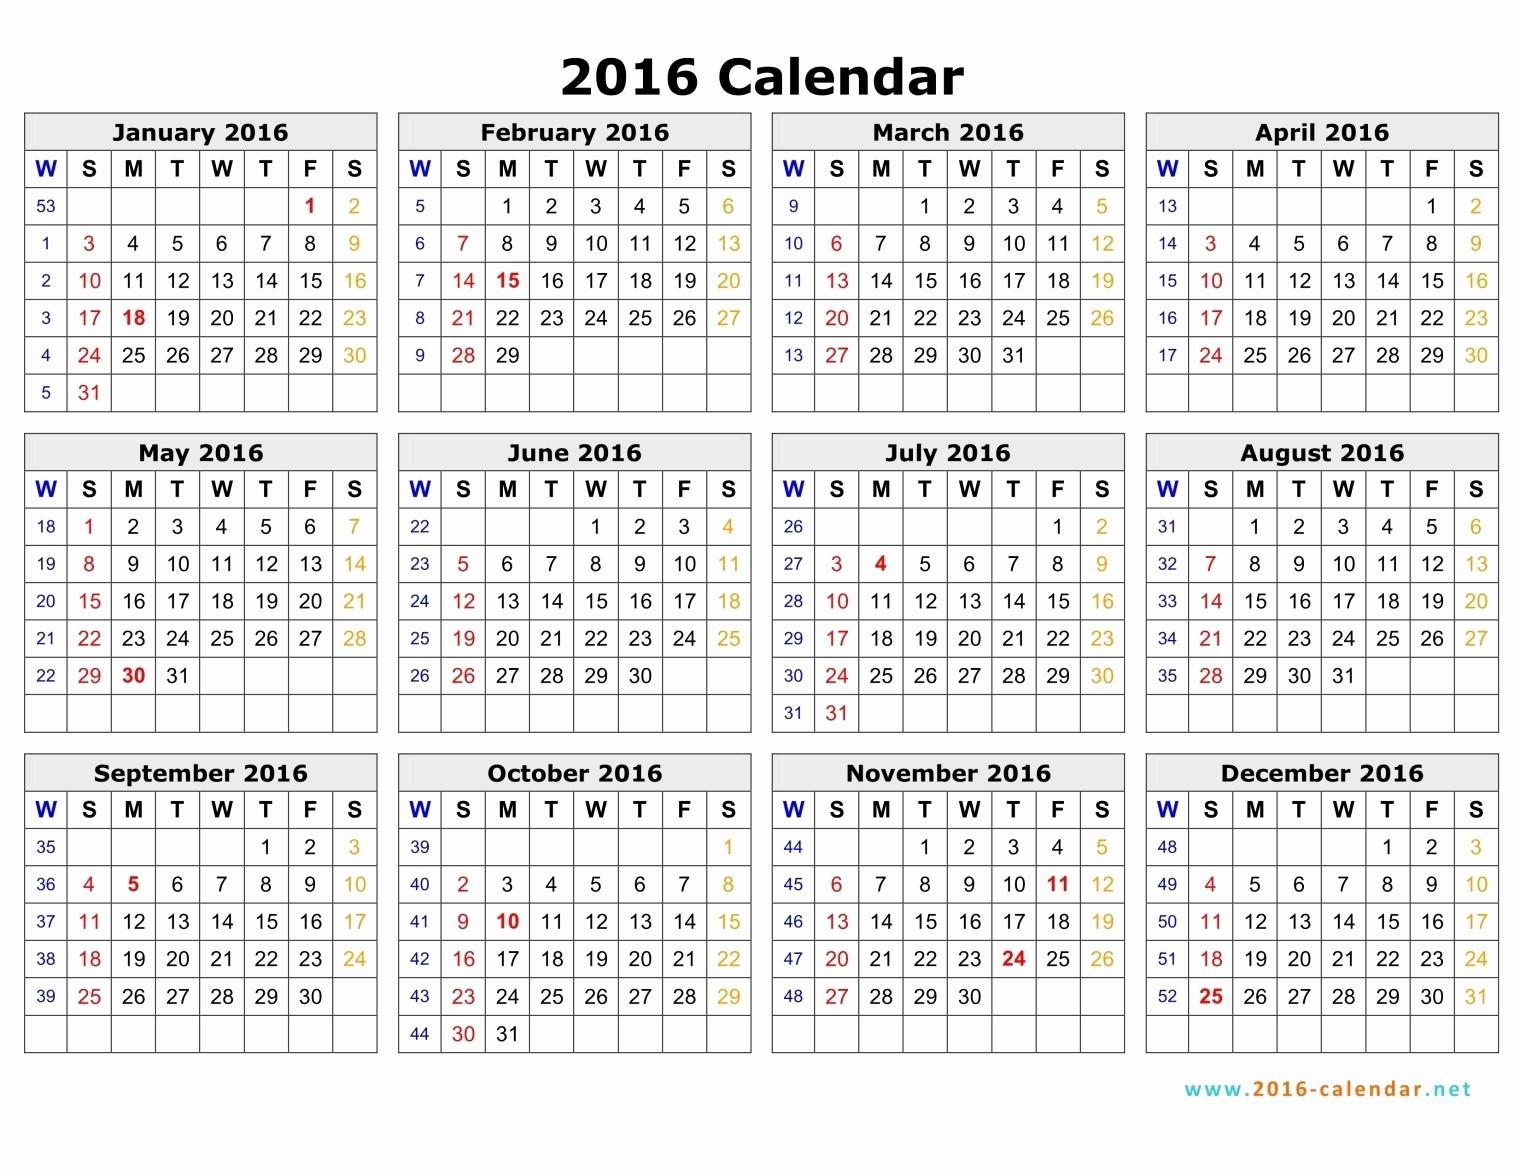 Monday to Sunday Calendar Template New 2016 Calendar Monday Through Sunday